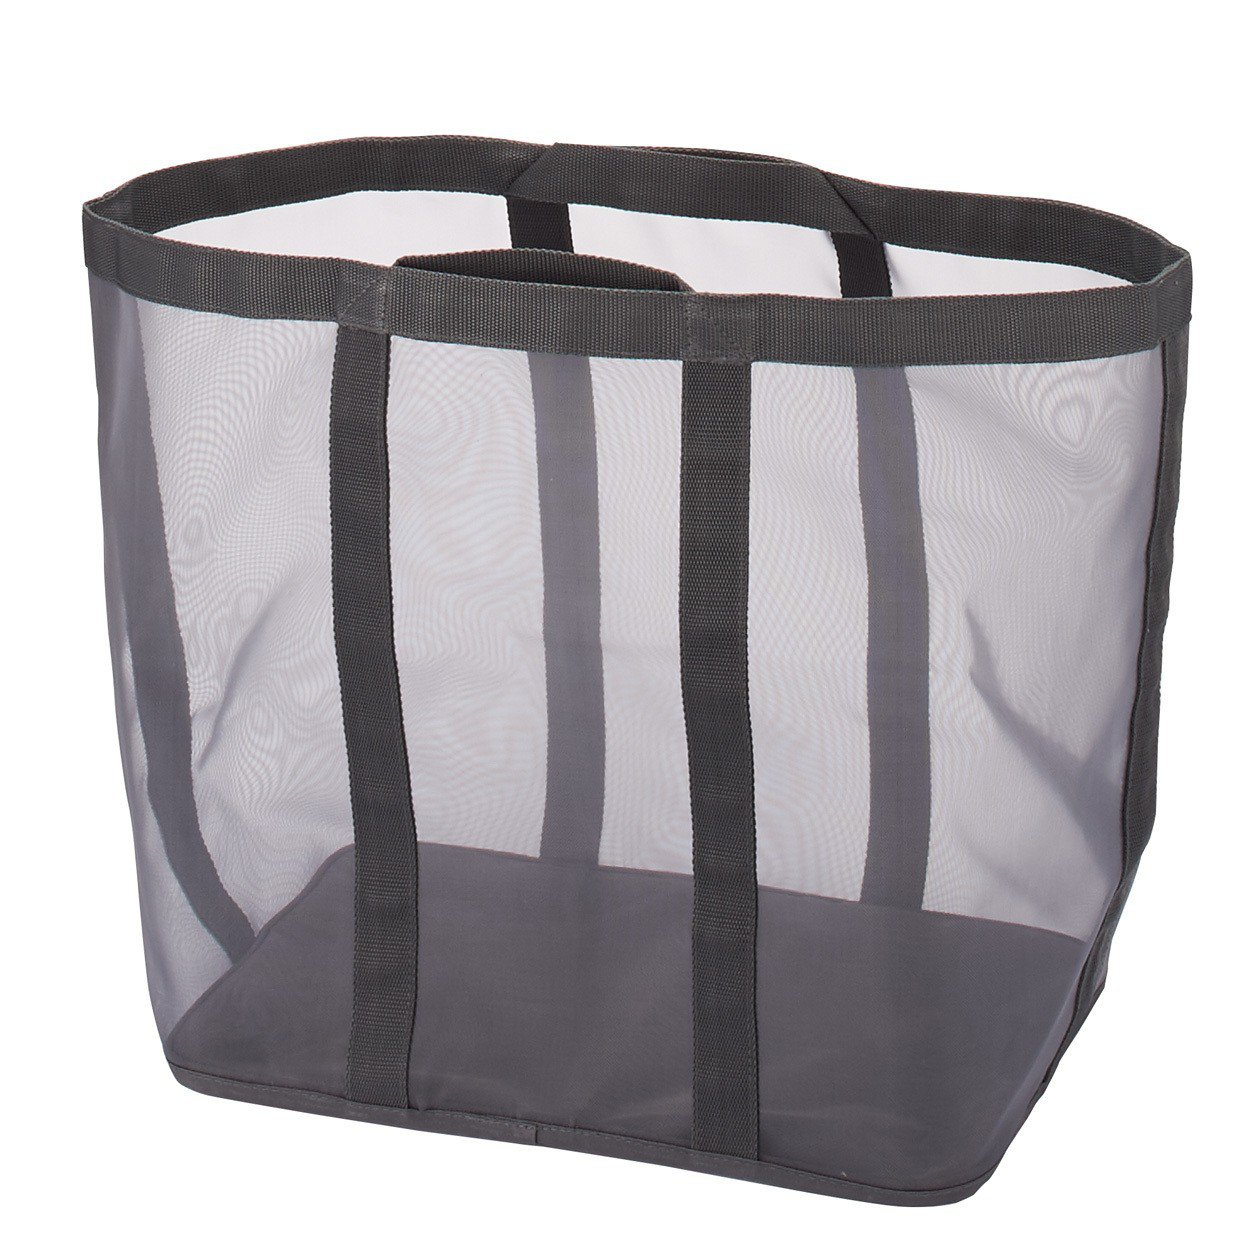 MUJI無印良品尼龍網狀洗衣籃,從原價810元調降為590元。圖/無印良品提供